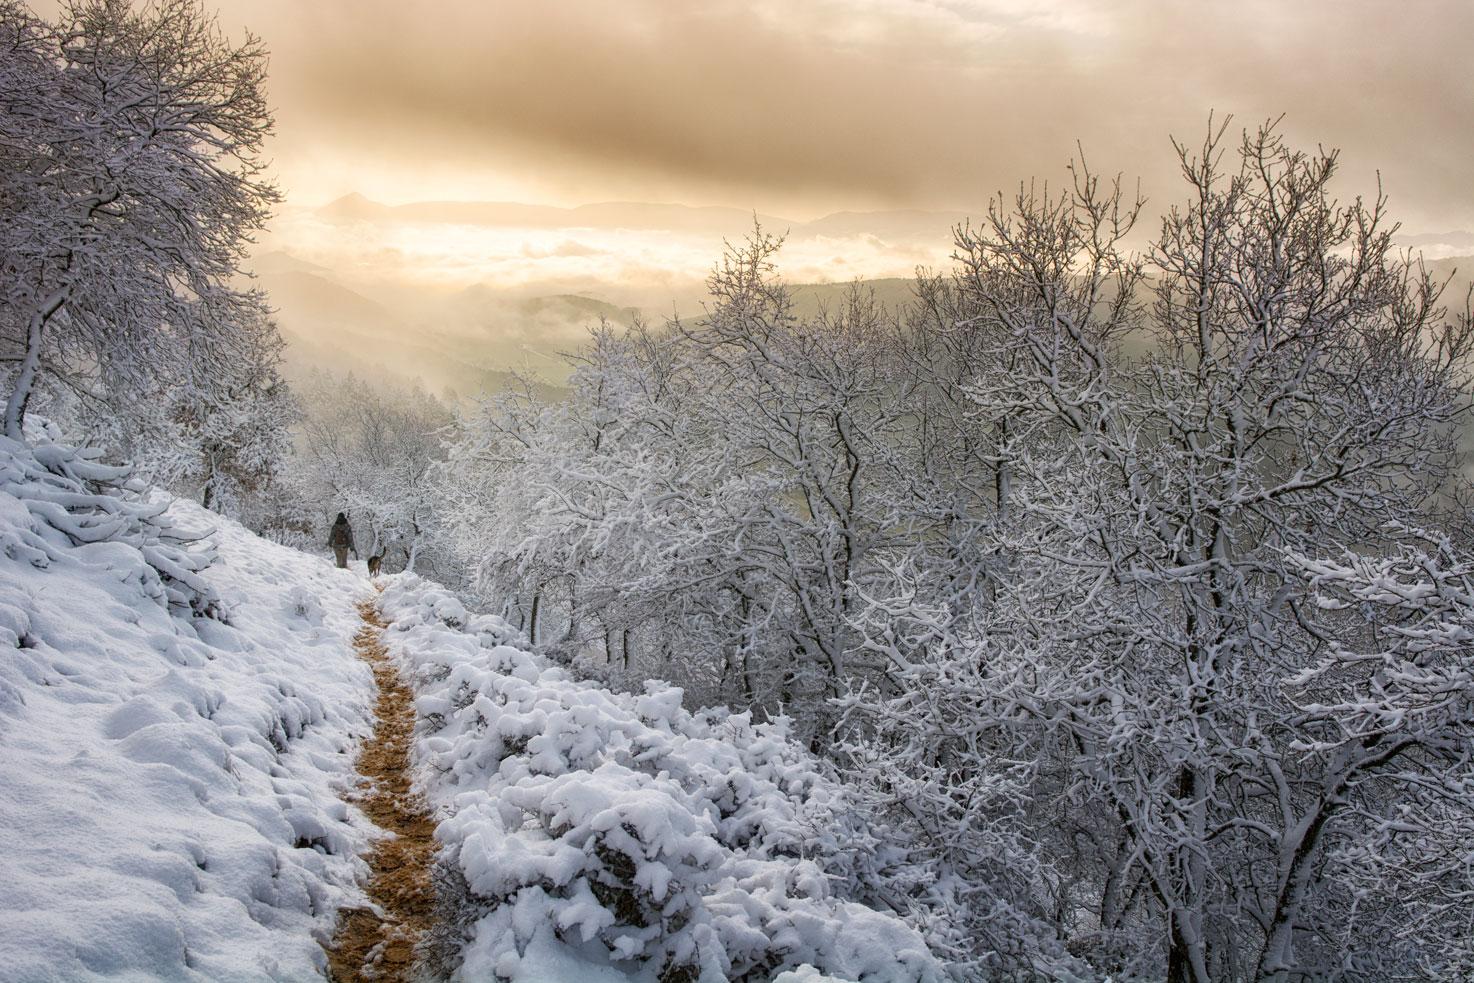 La senda - Deportes y aventuras - Inaki Larrea, Nature and mountains Photography